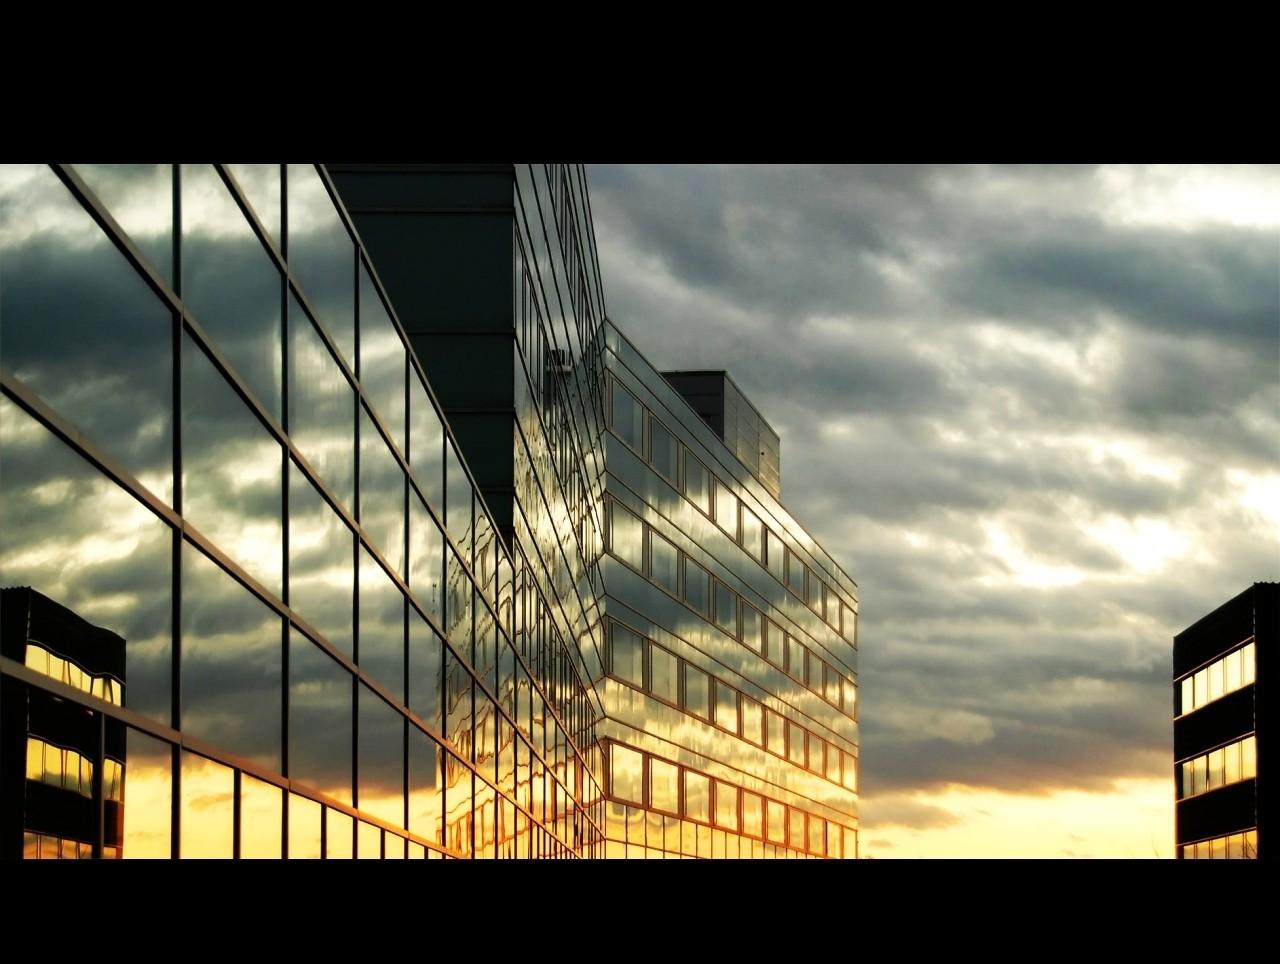 windowslisisoftcom City Skies Wallpaper 1280x964